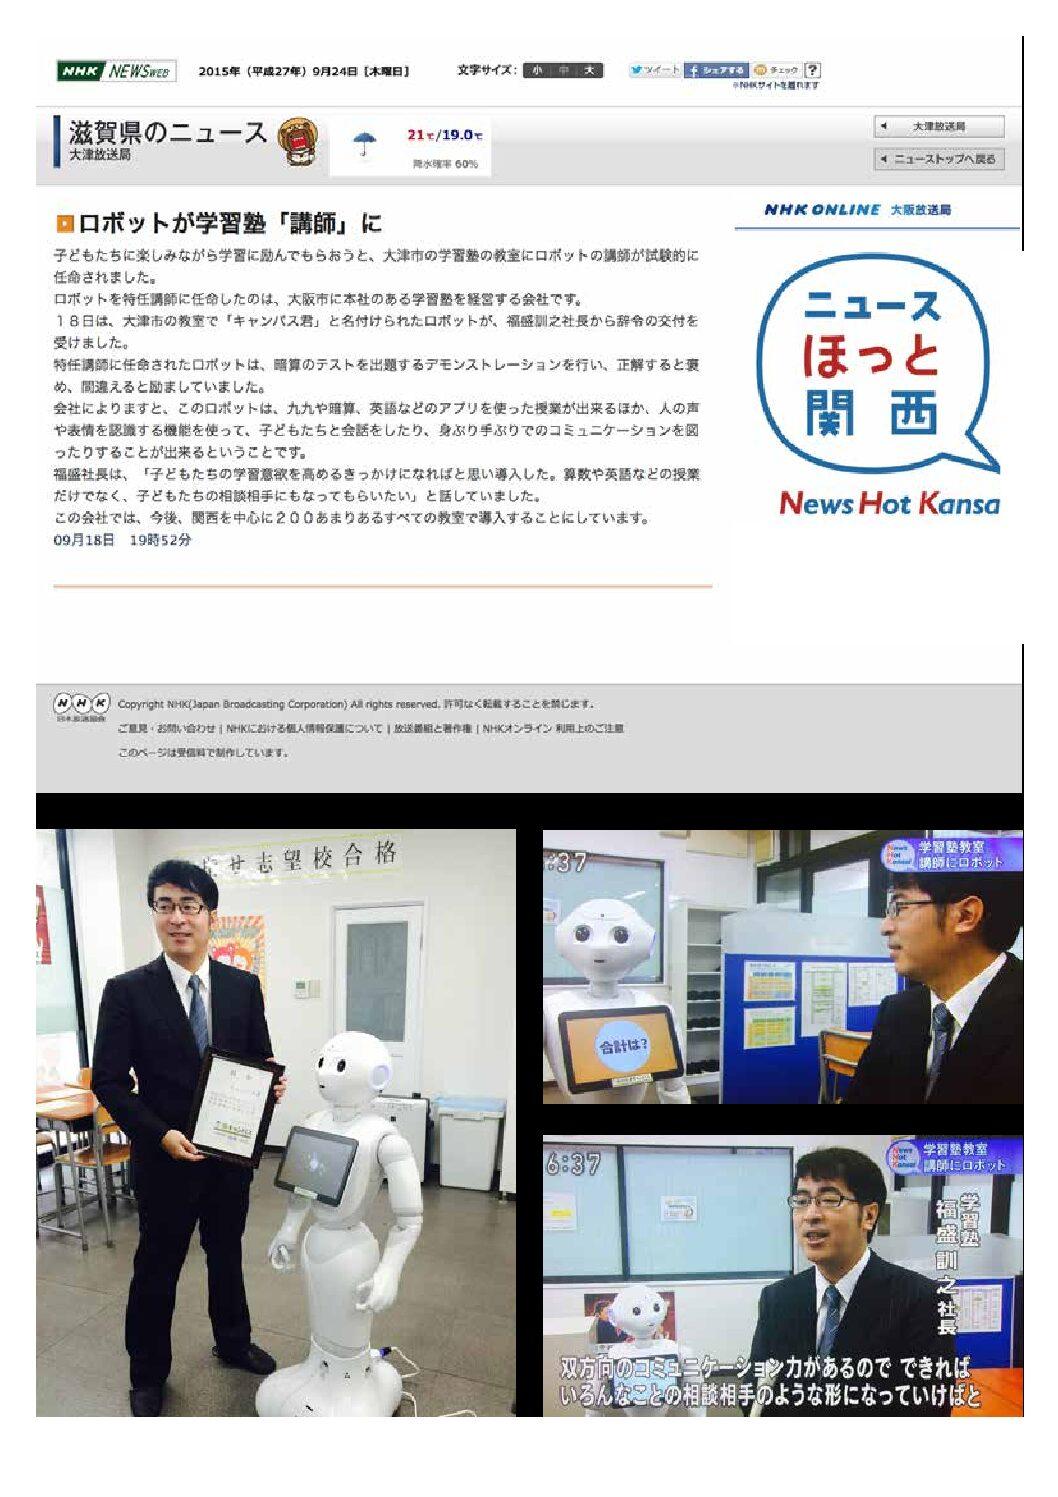 NHK「ニュースほっと関西 」で特集されました。